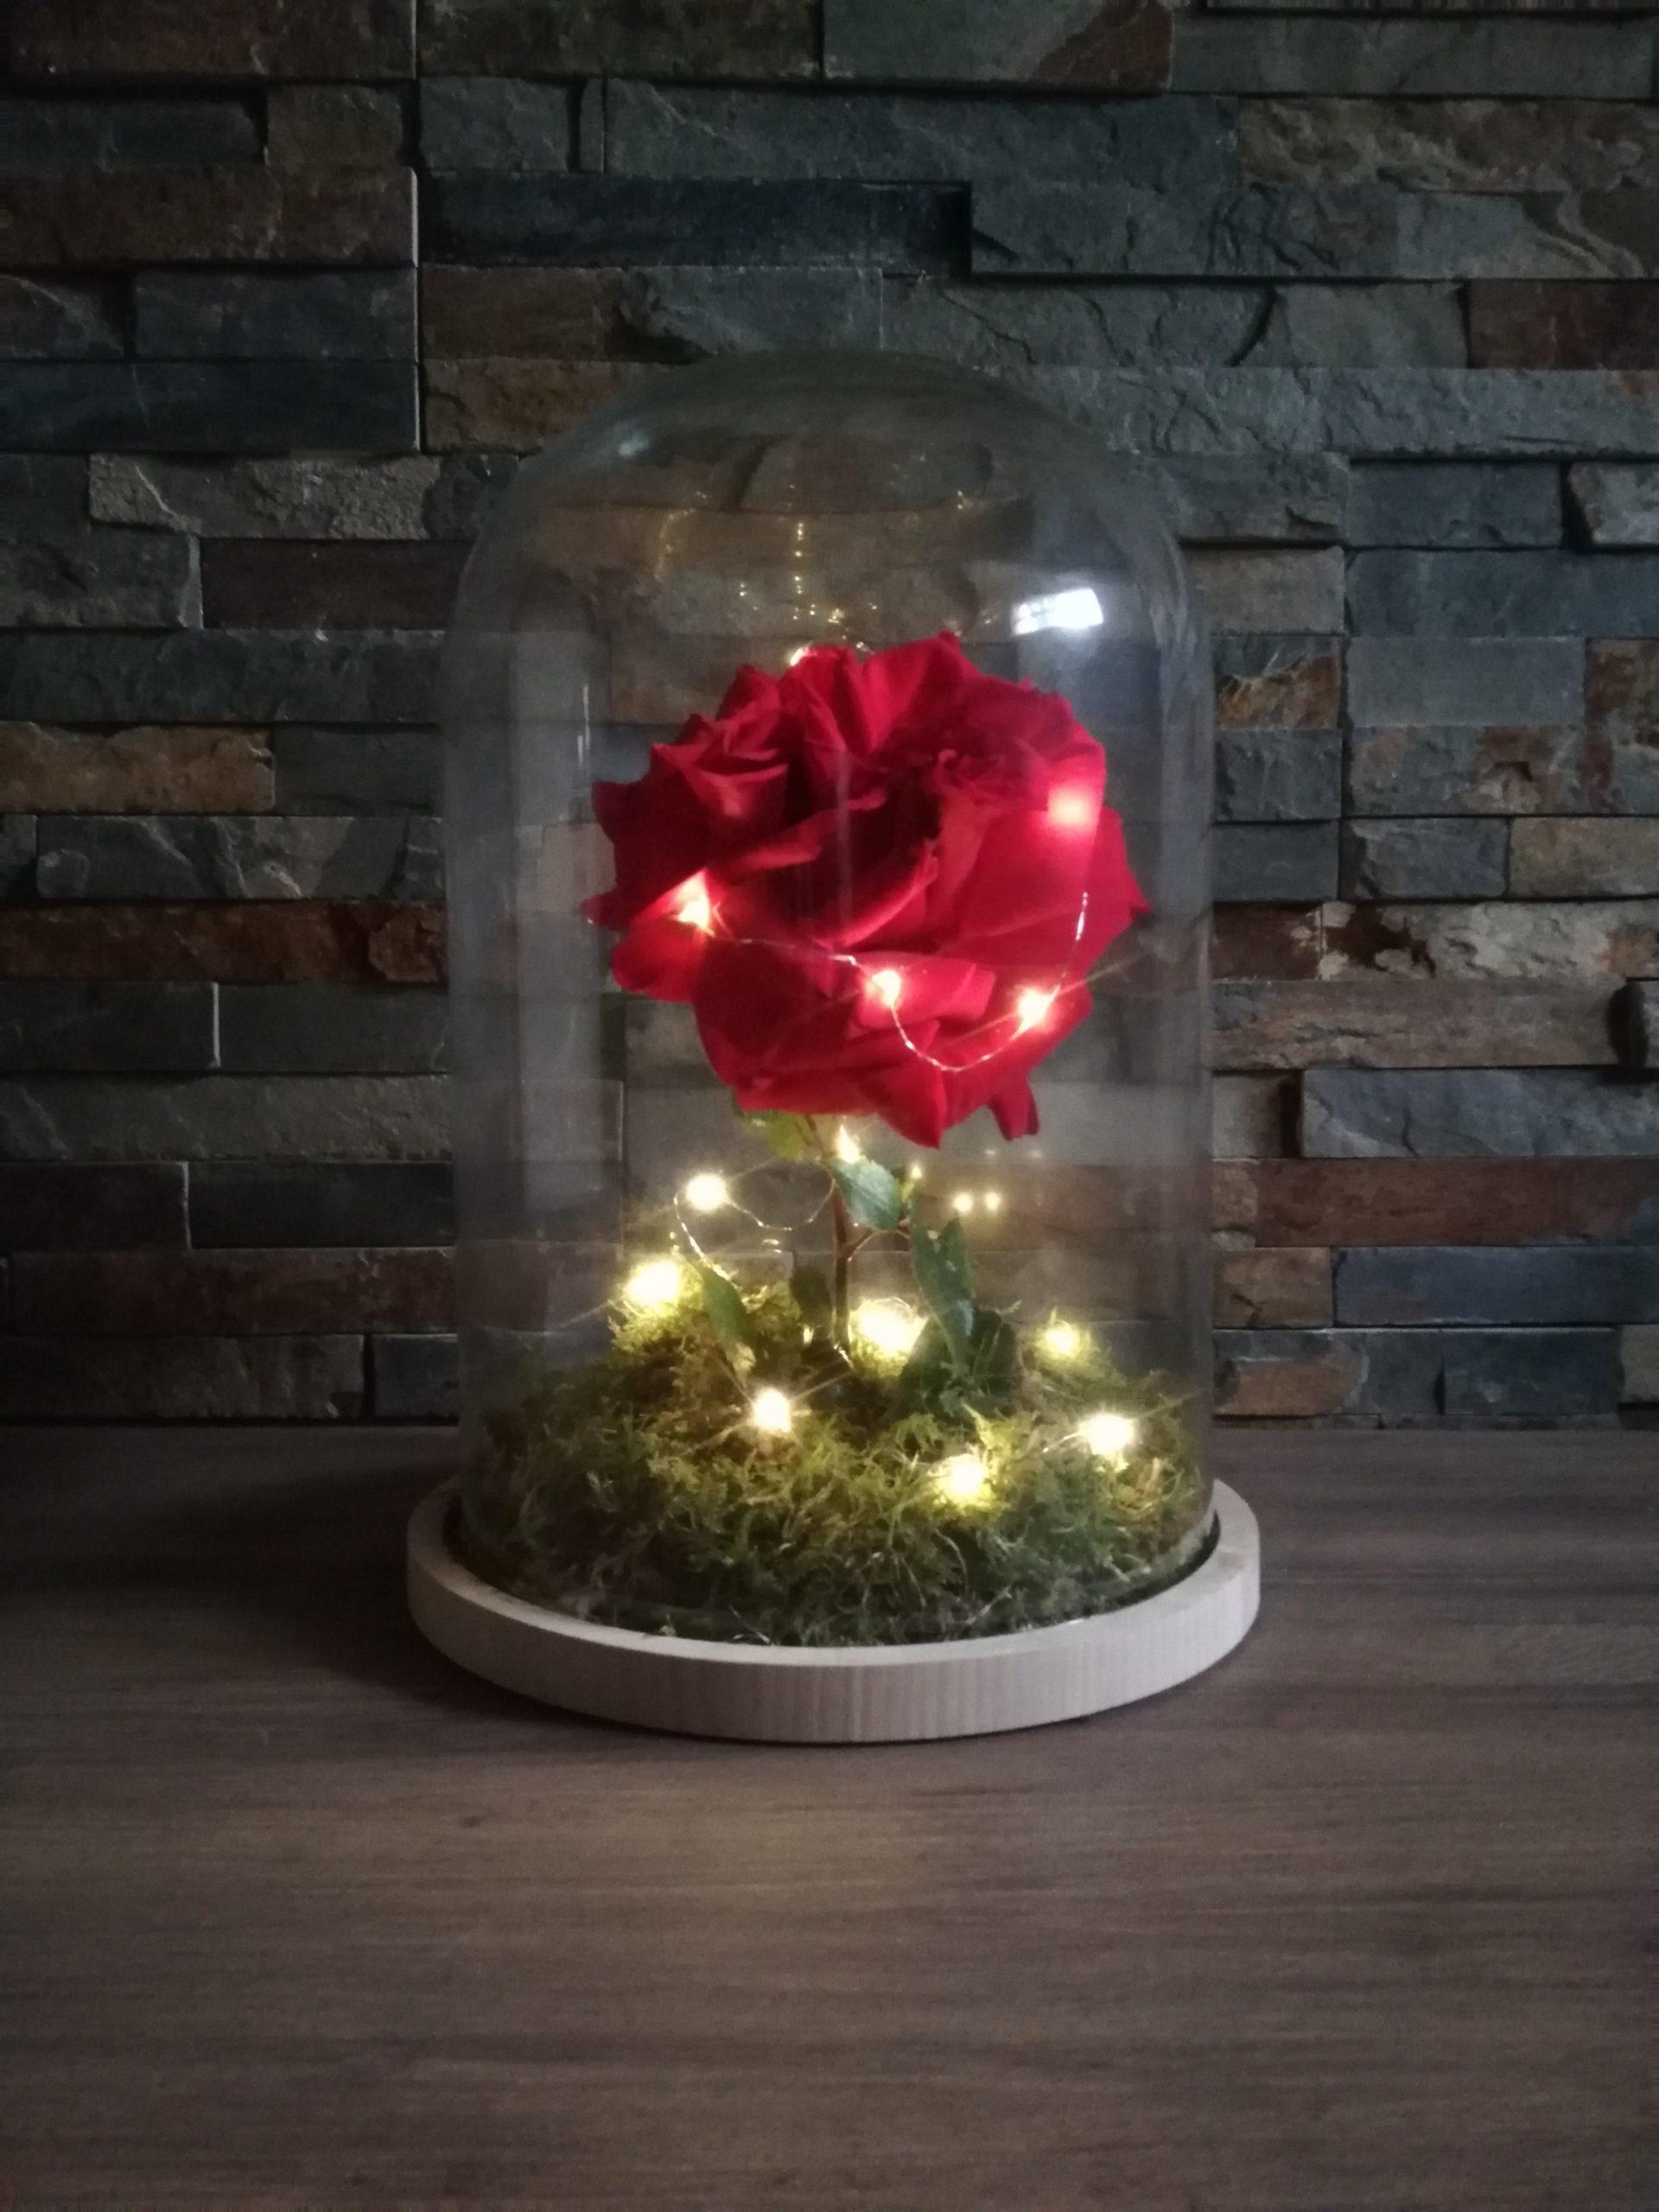 Décoration : Vase, chandelier, lanterne...